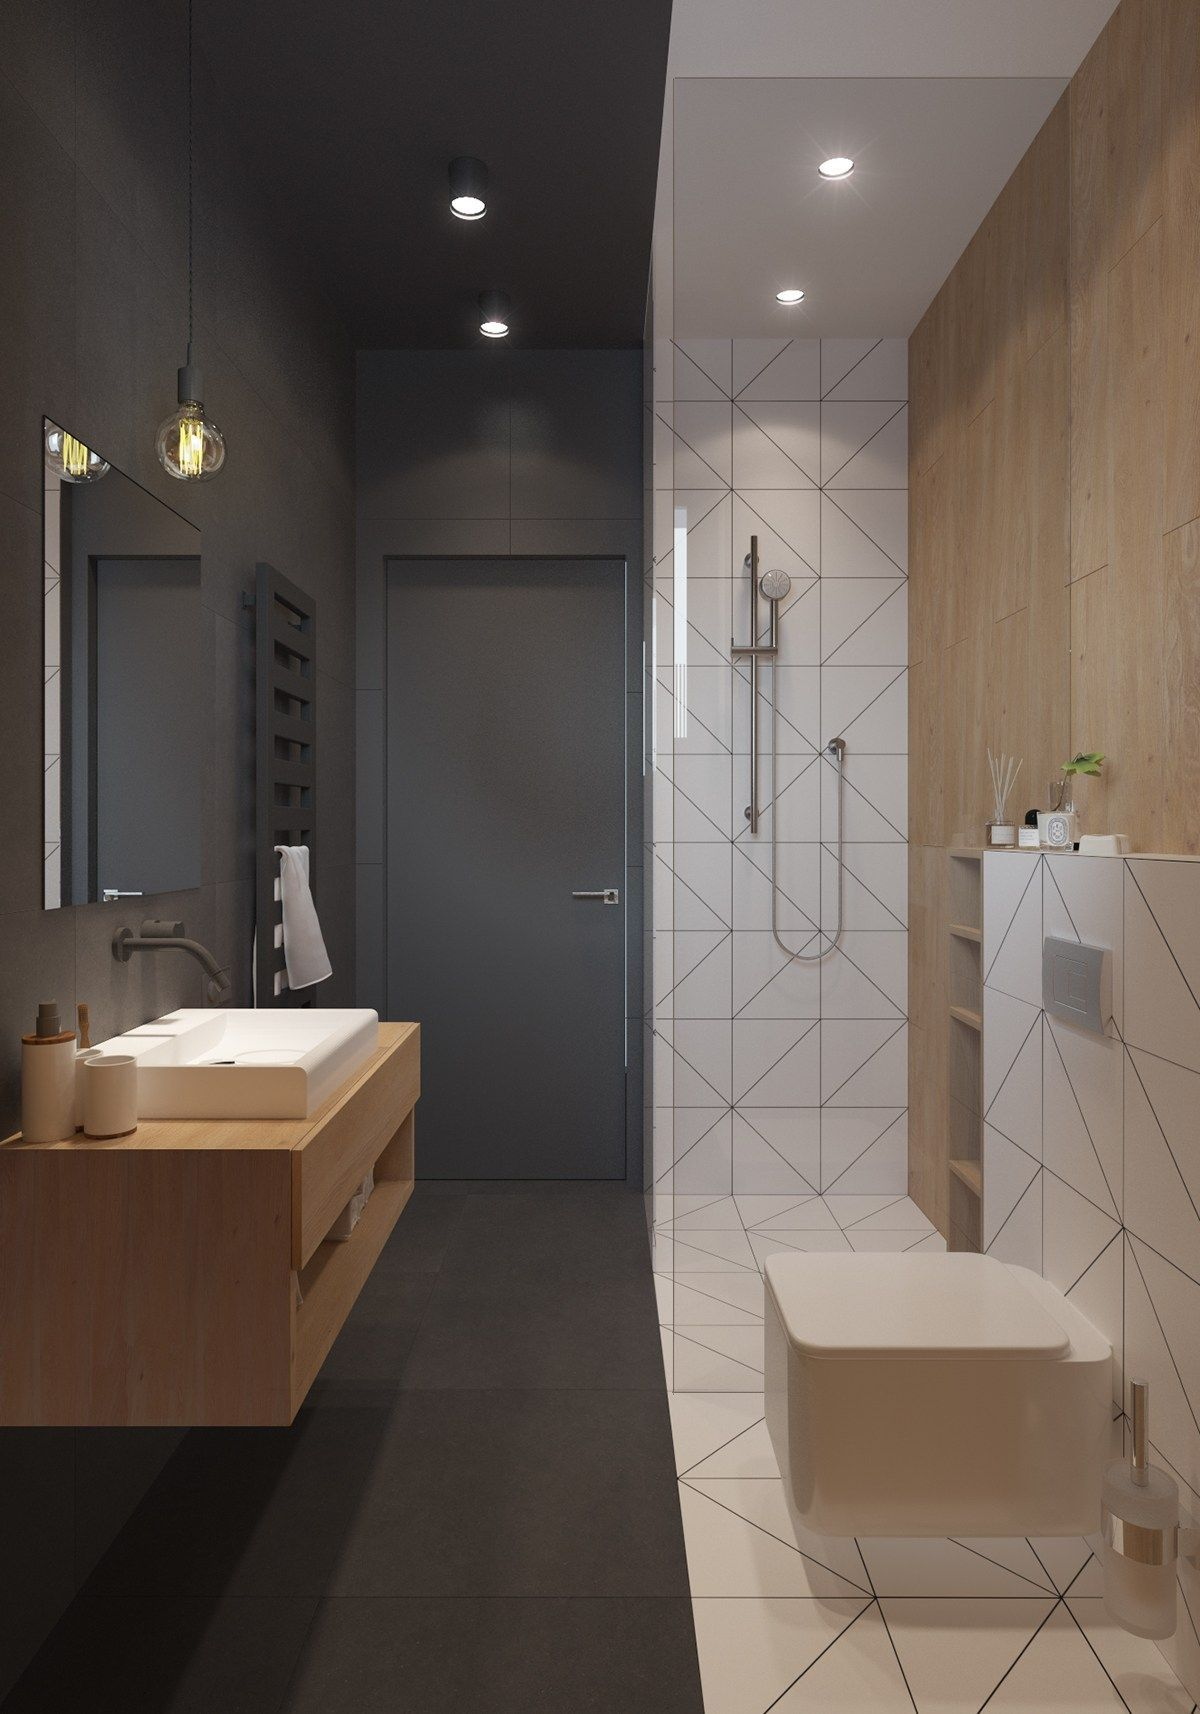 homedesigning via a sleek and surprising interior inspired by scandinavian modernism bathroom